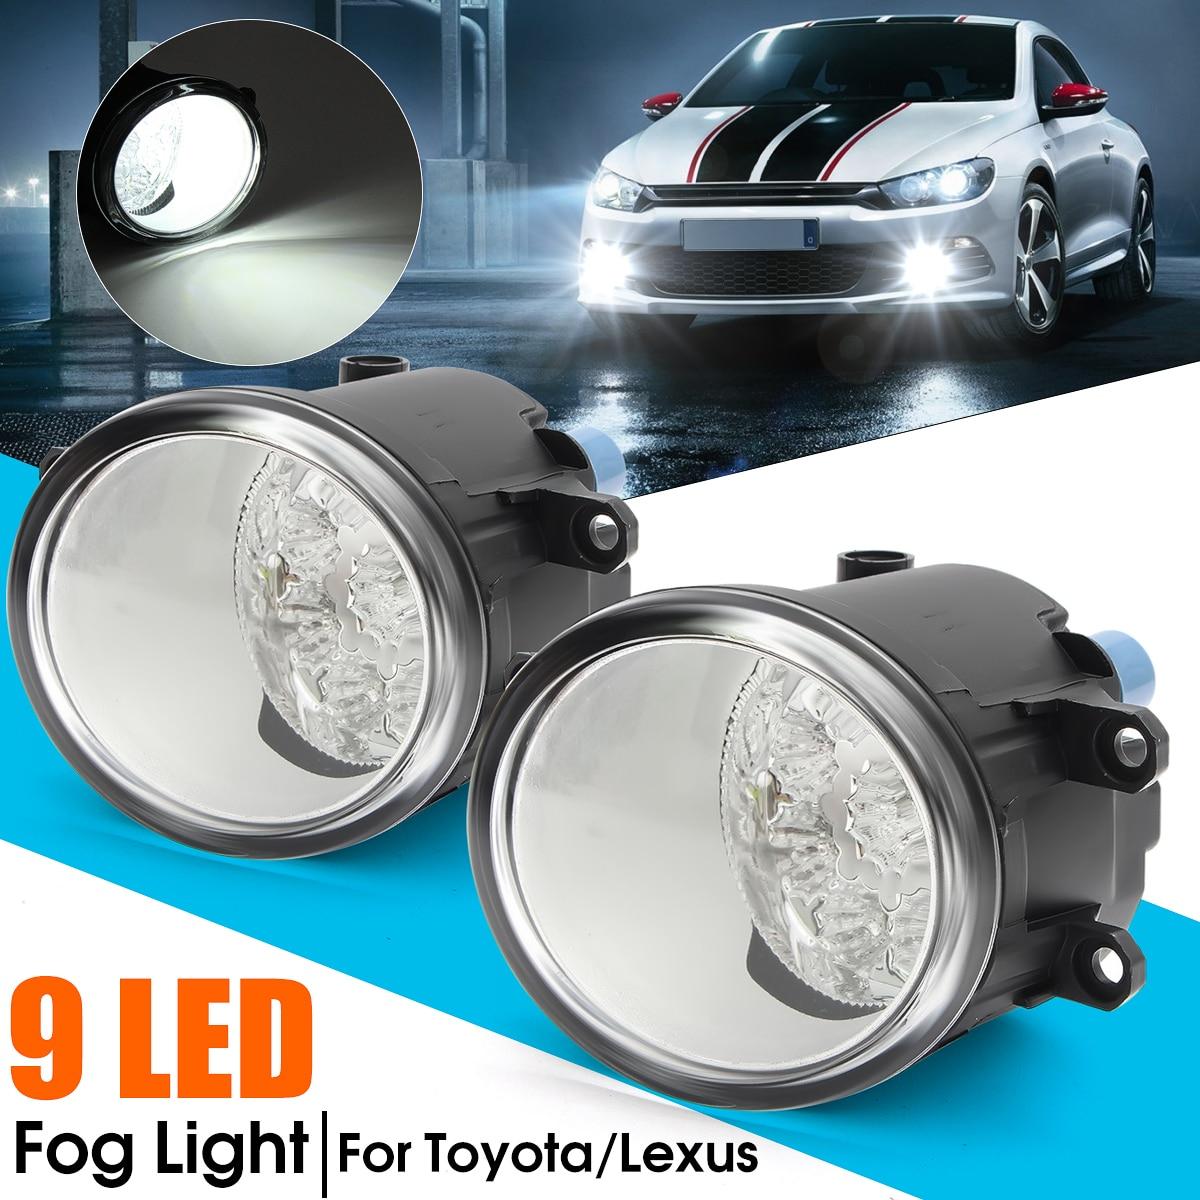 2 шт. 9 светодиодных противотуманных фар для Toyota Corolla Camry Yaris Vios RAV4 для Lexus RX350 RX450 LX570